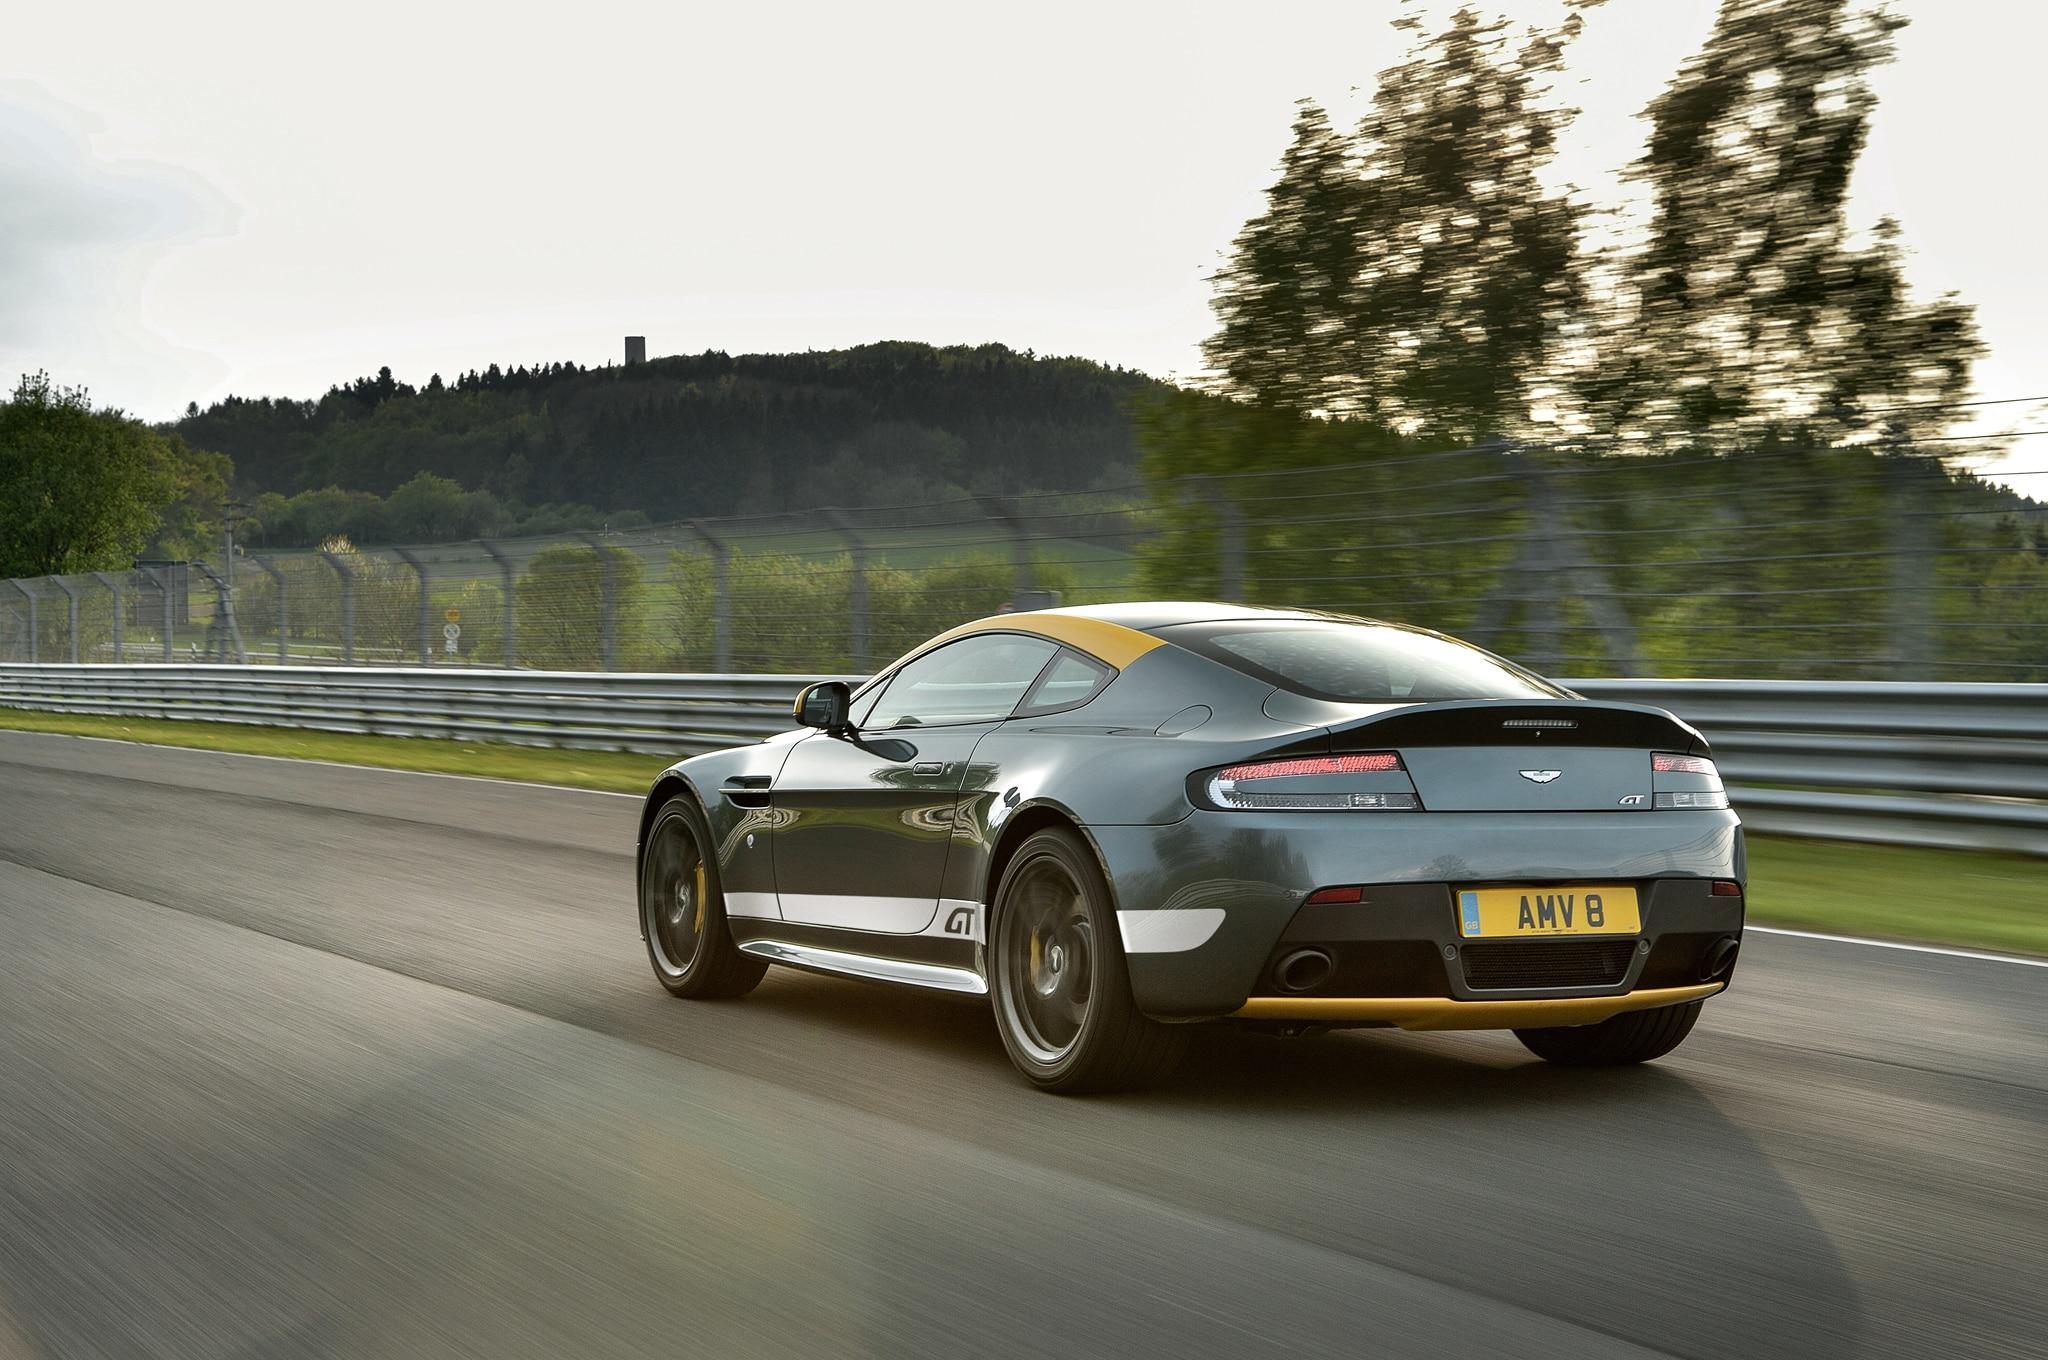 2015 Aston Martin V8 Vantage GT Review